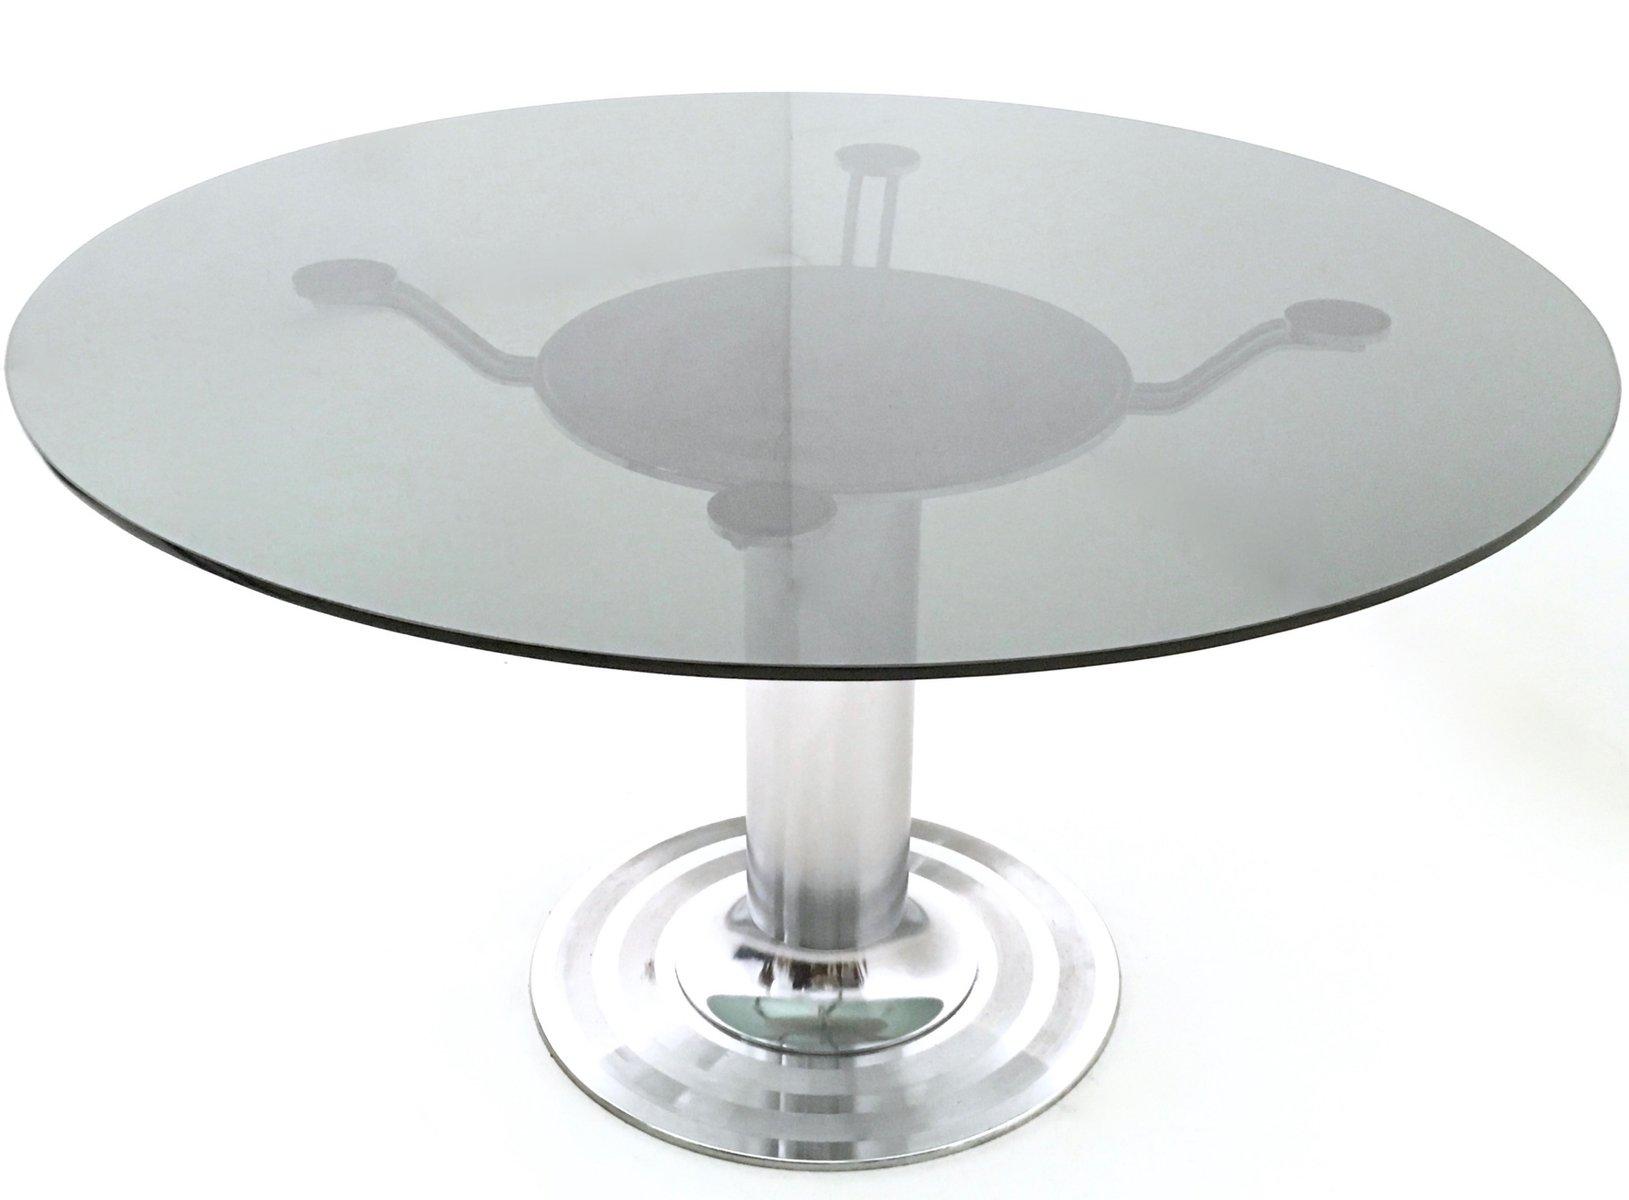 table de salle manger ronde en m tal chrom et verre 1970s en vente sur pamono. Black Bedroom Furniture Sets. Home Design Ideas